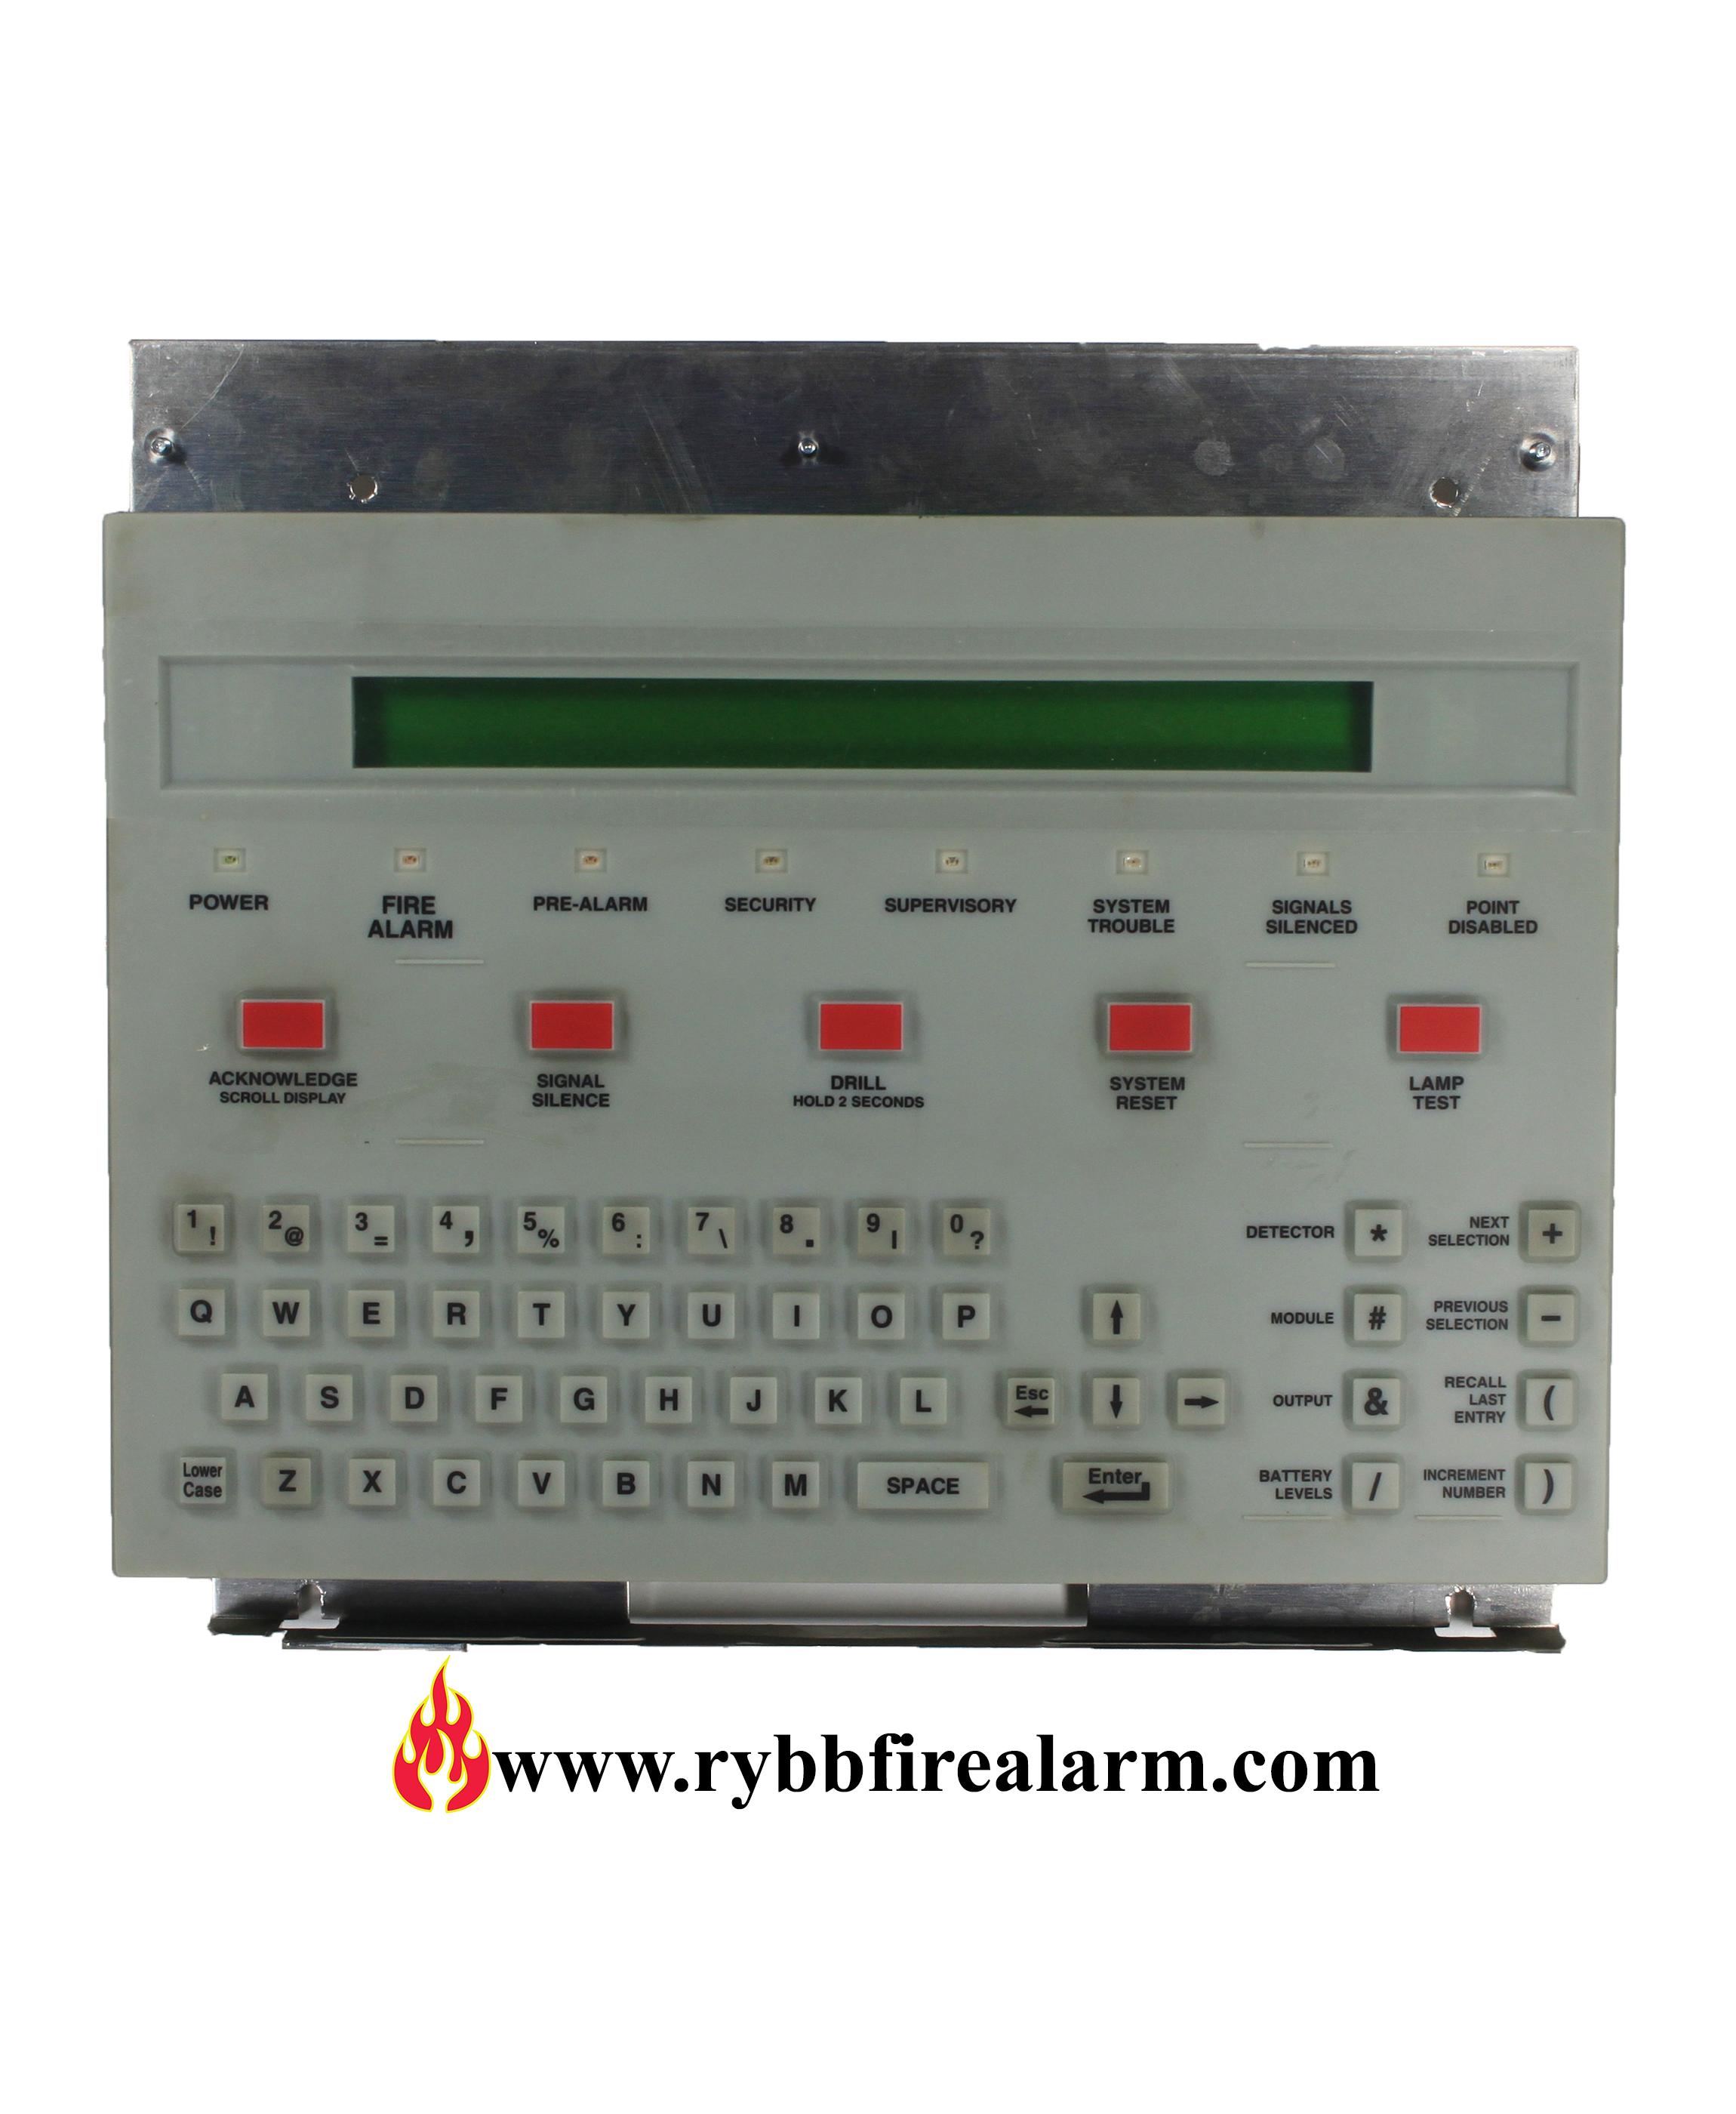 Notifier Kdm 2 Keypad For An Nfs 640 Rybb Fire Alarm